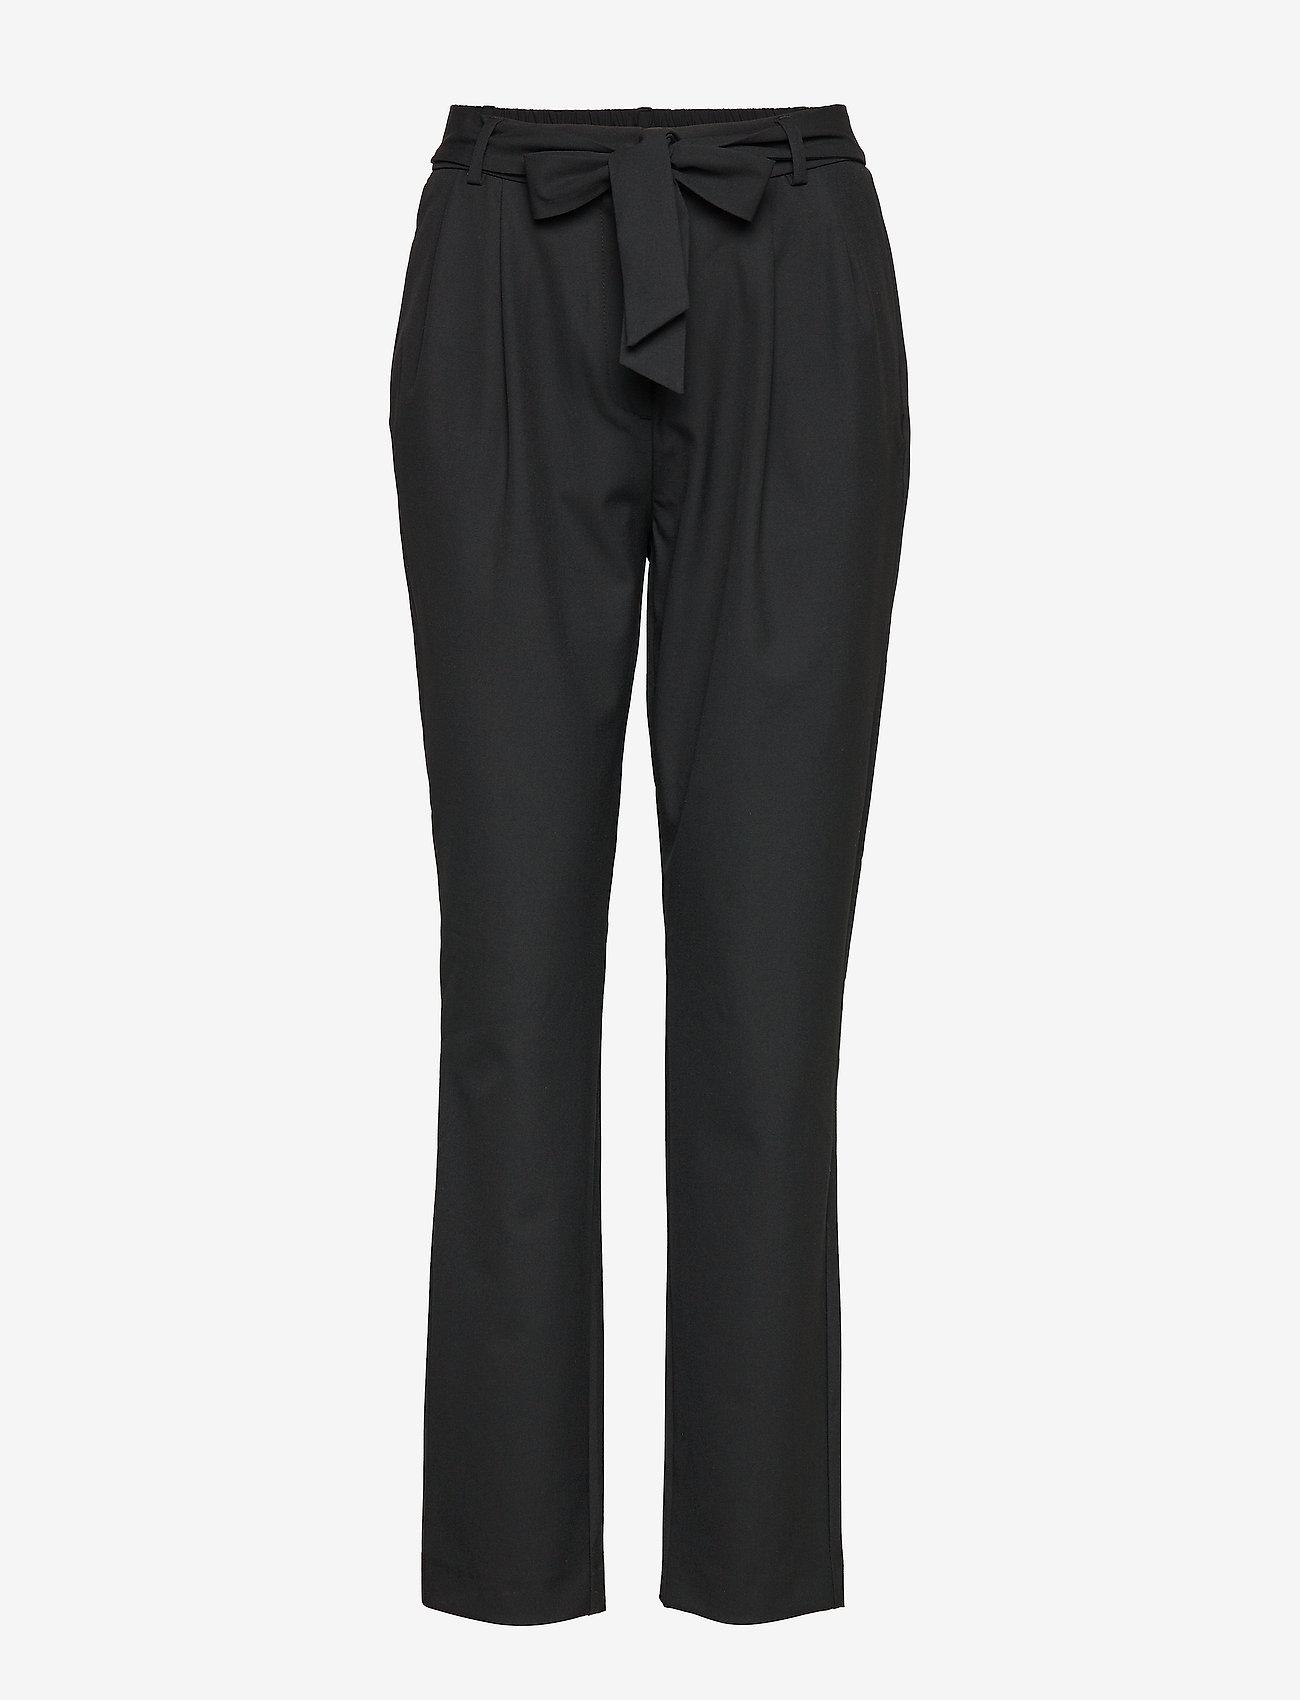 Selected Femme - SLFBIO KIPAS MW PANT NOOS - straight leg trousers - black - 0